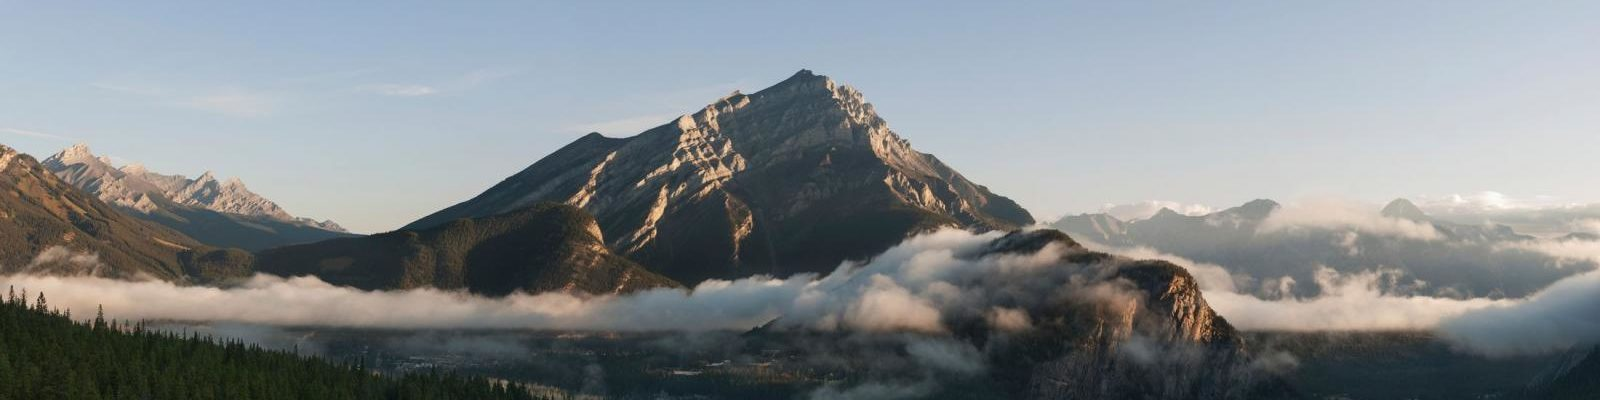 001911_View from Rimrock Resort_Banff National Park_Alberta - Photo Credit Copithorne and Blakely_Travel Alberta_001